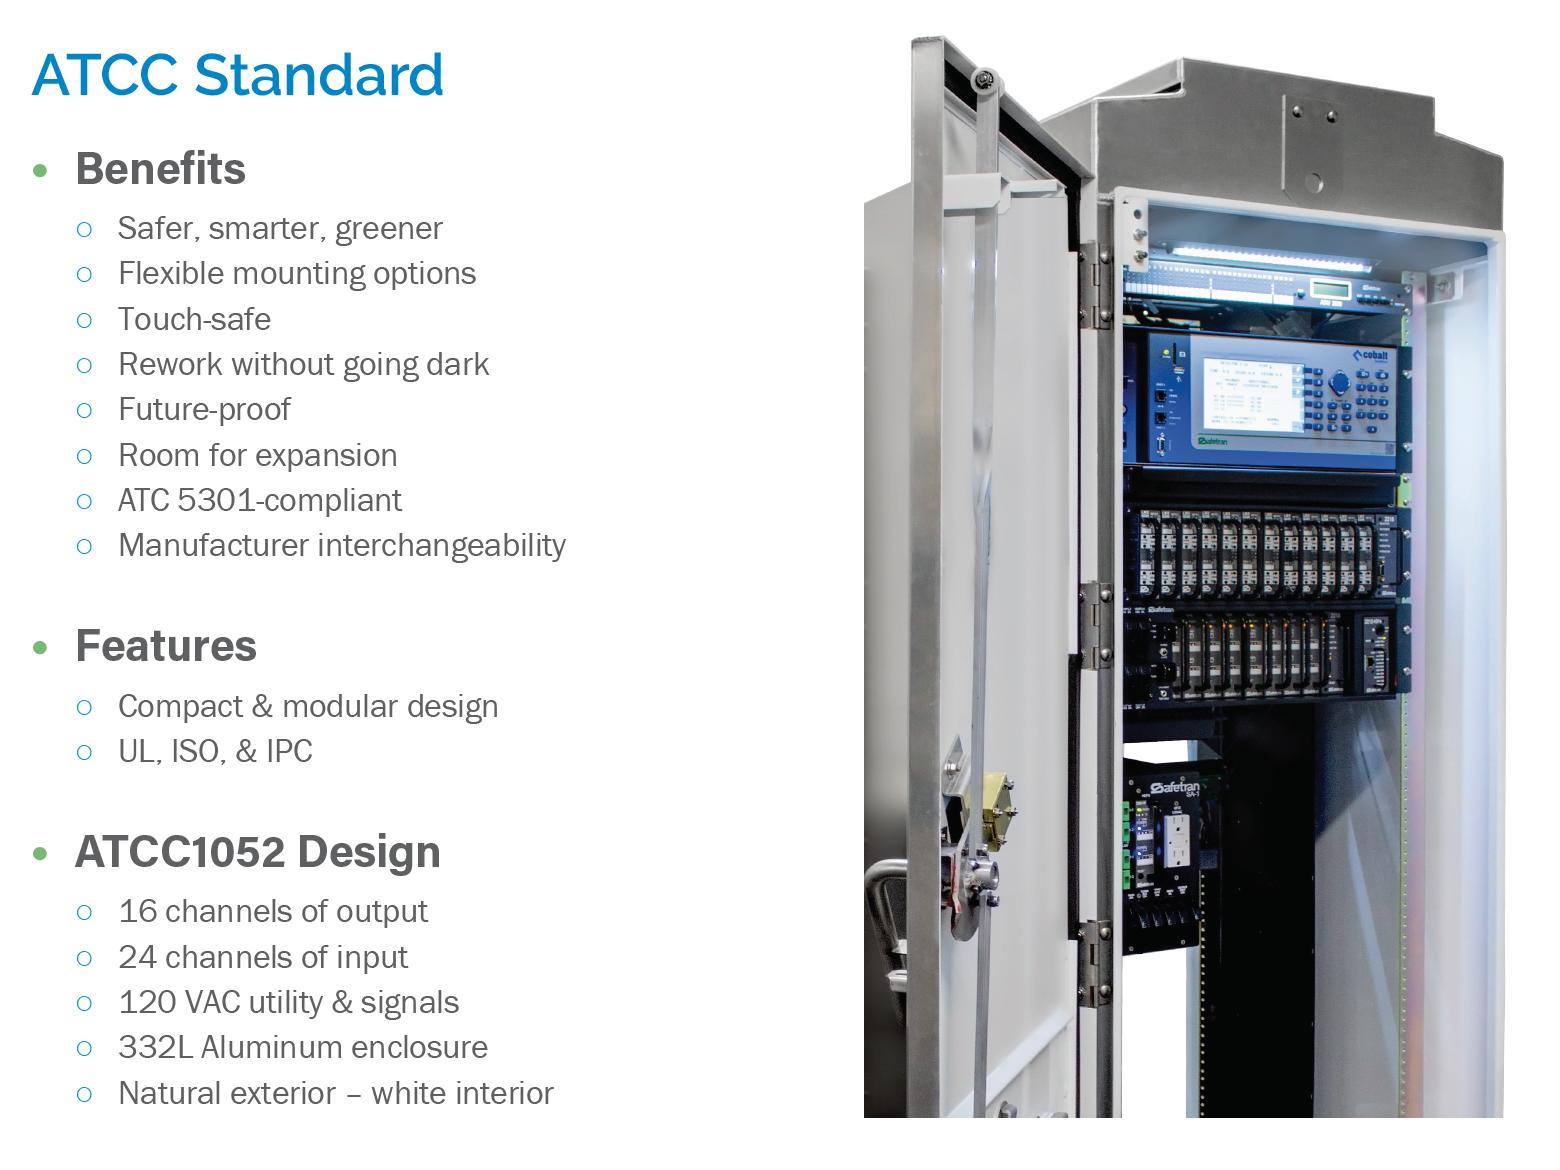 ATCC Standard